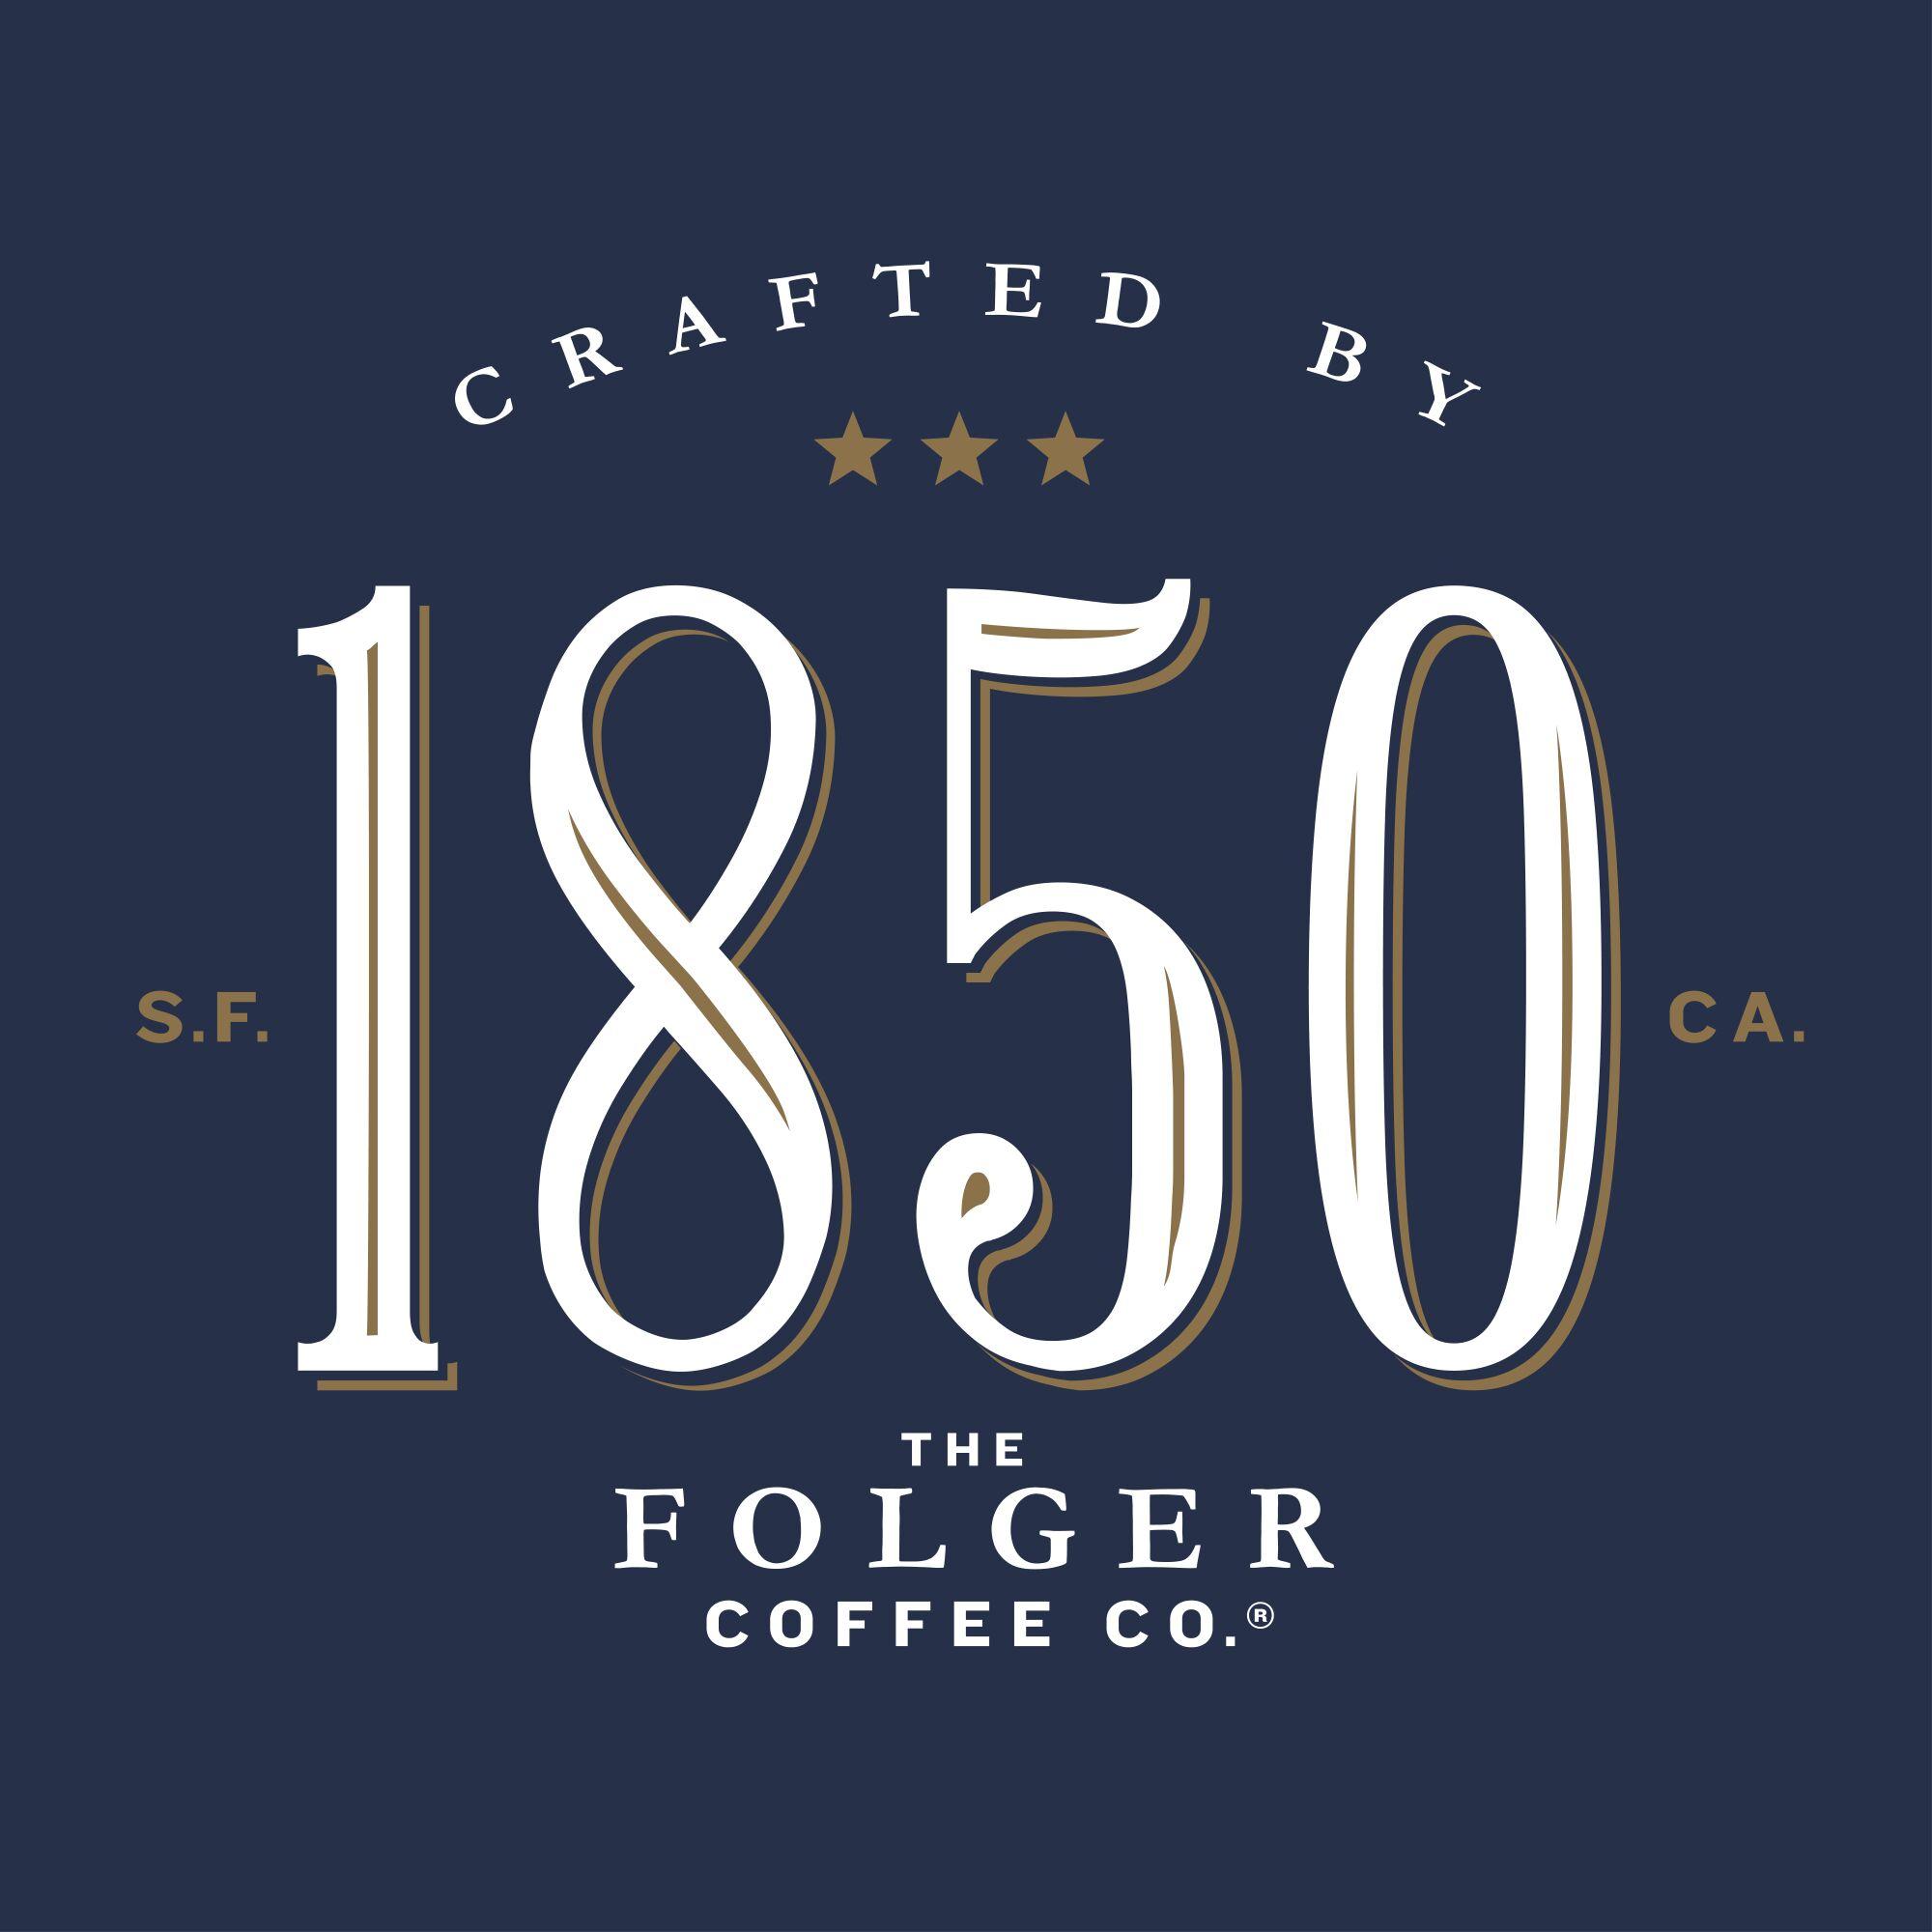 1850 logo